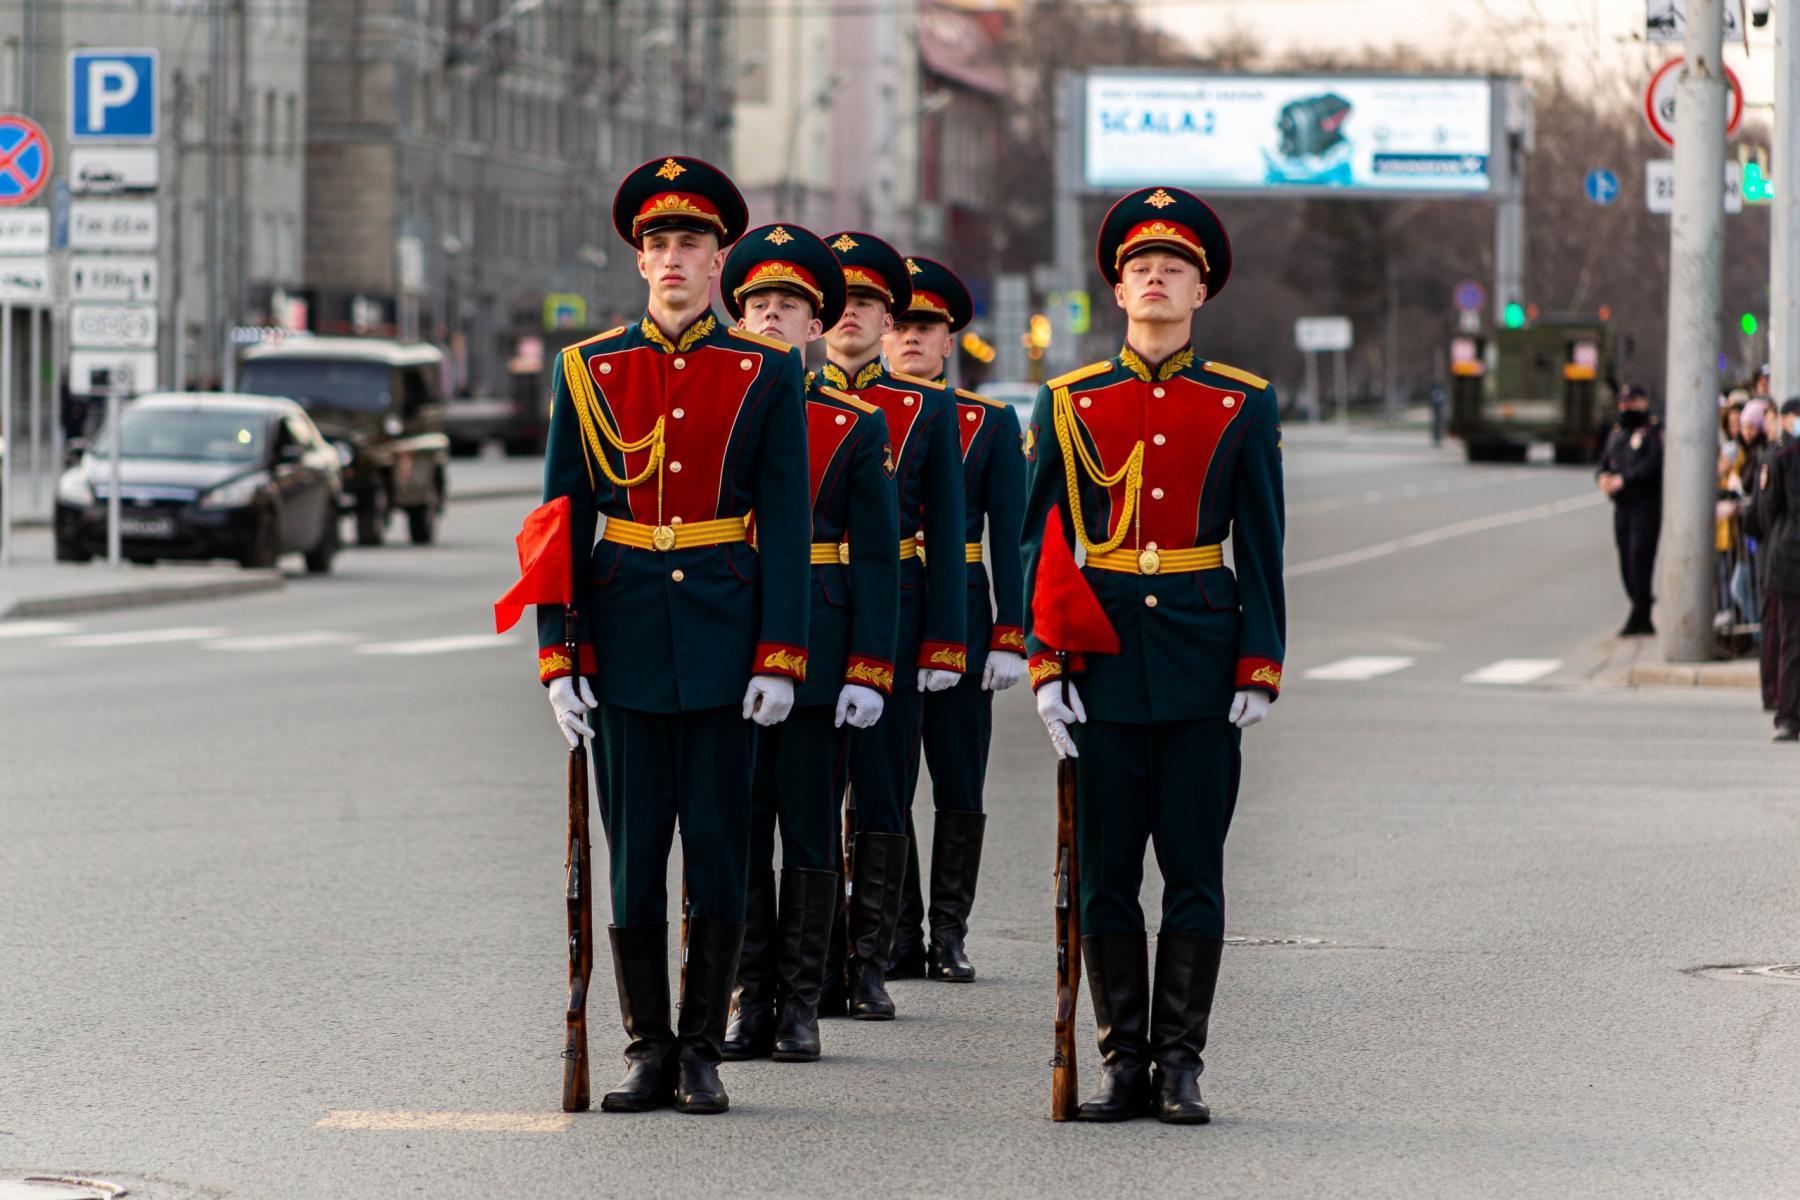 Фото Флаги, форма, техника, толпы зрителей: лучшие фото с репетиции парада в Новосибирске 7